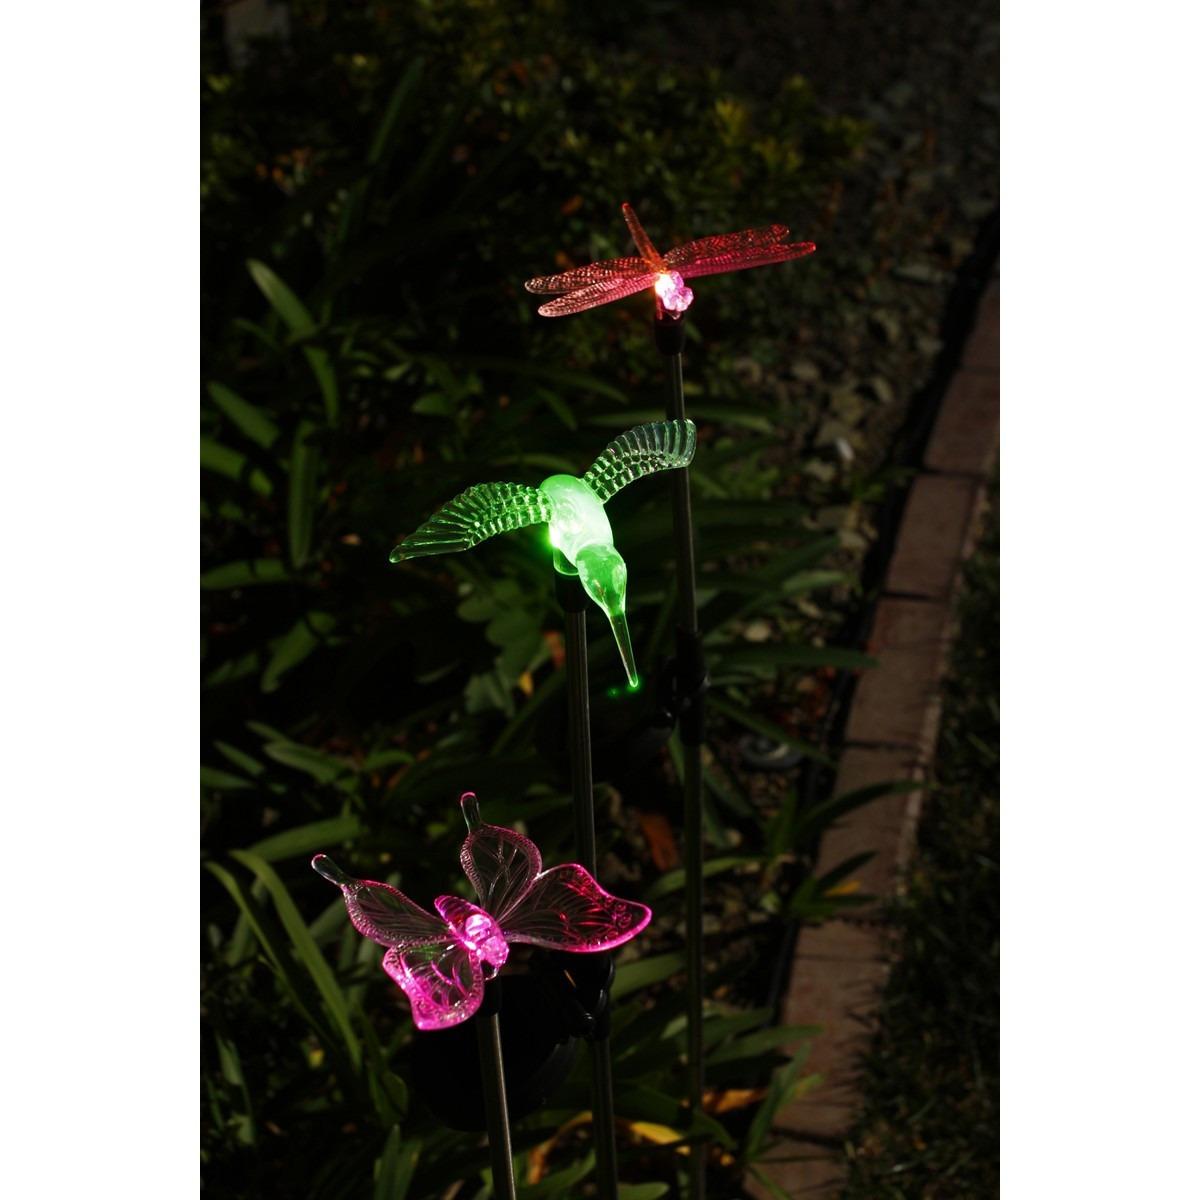 3 lamparas solares luces leds lampara jardin patio solar en mercadolibre - Luces de jardin solares ...